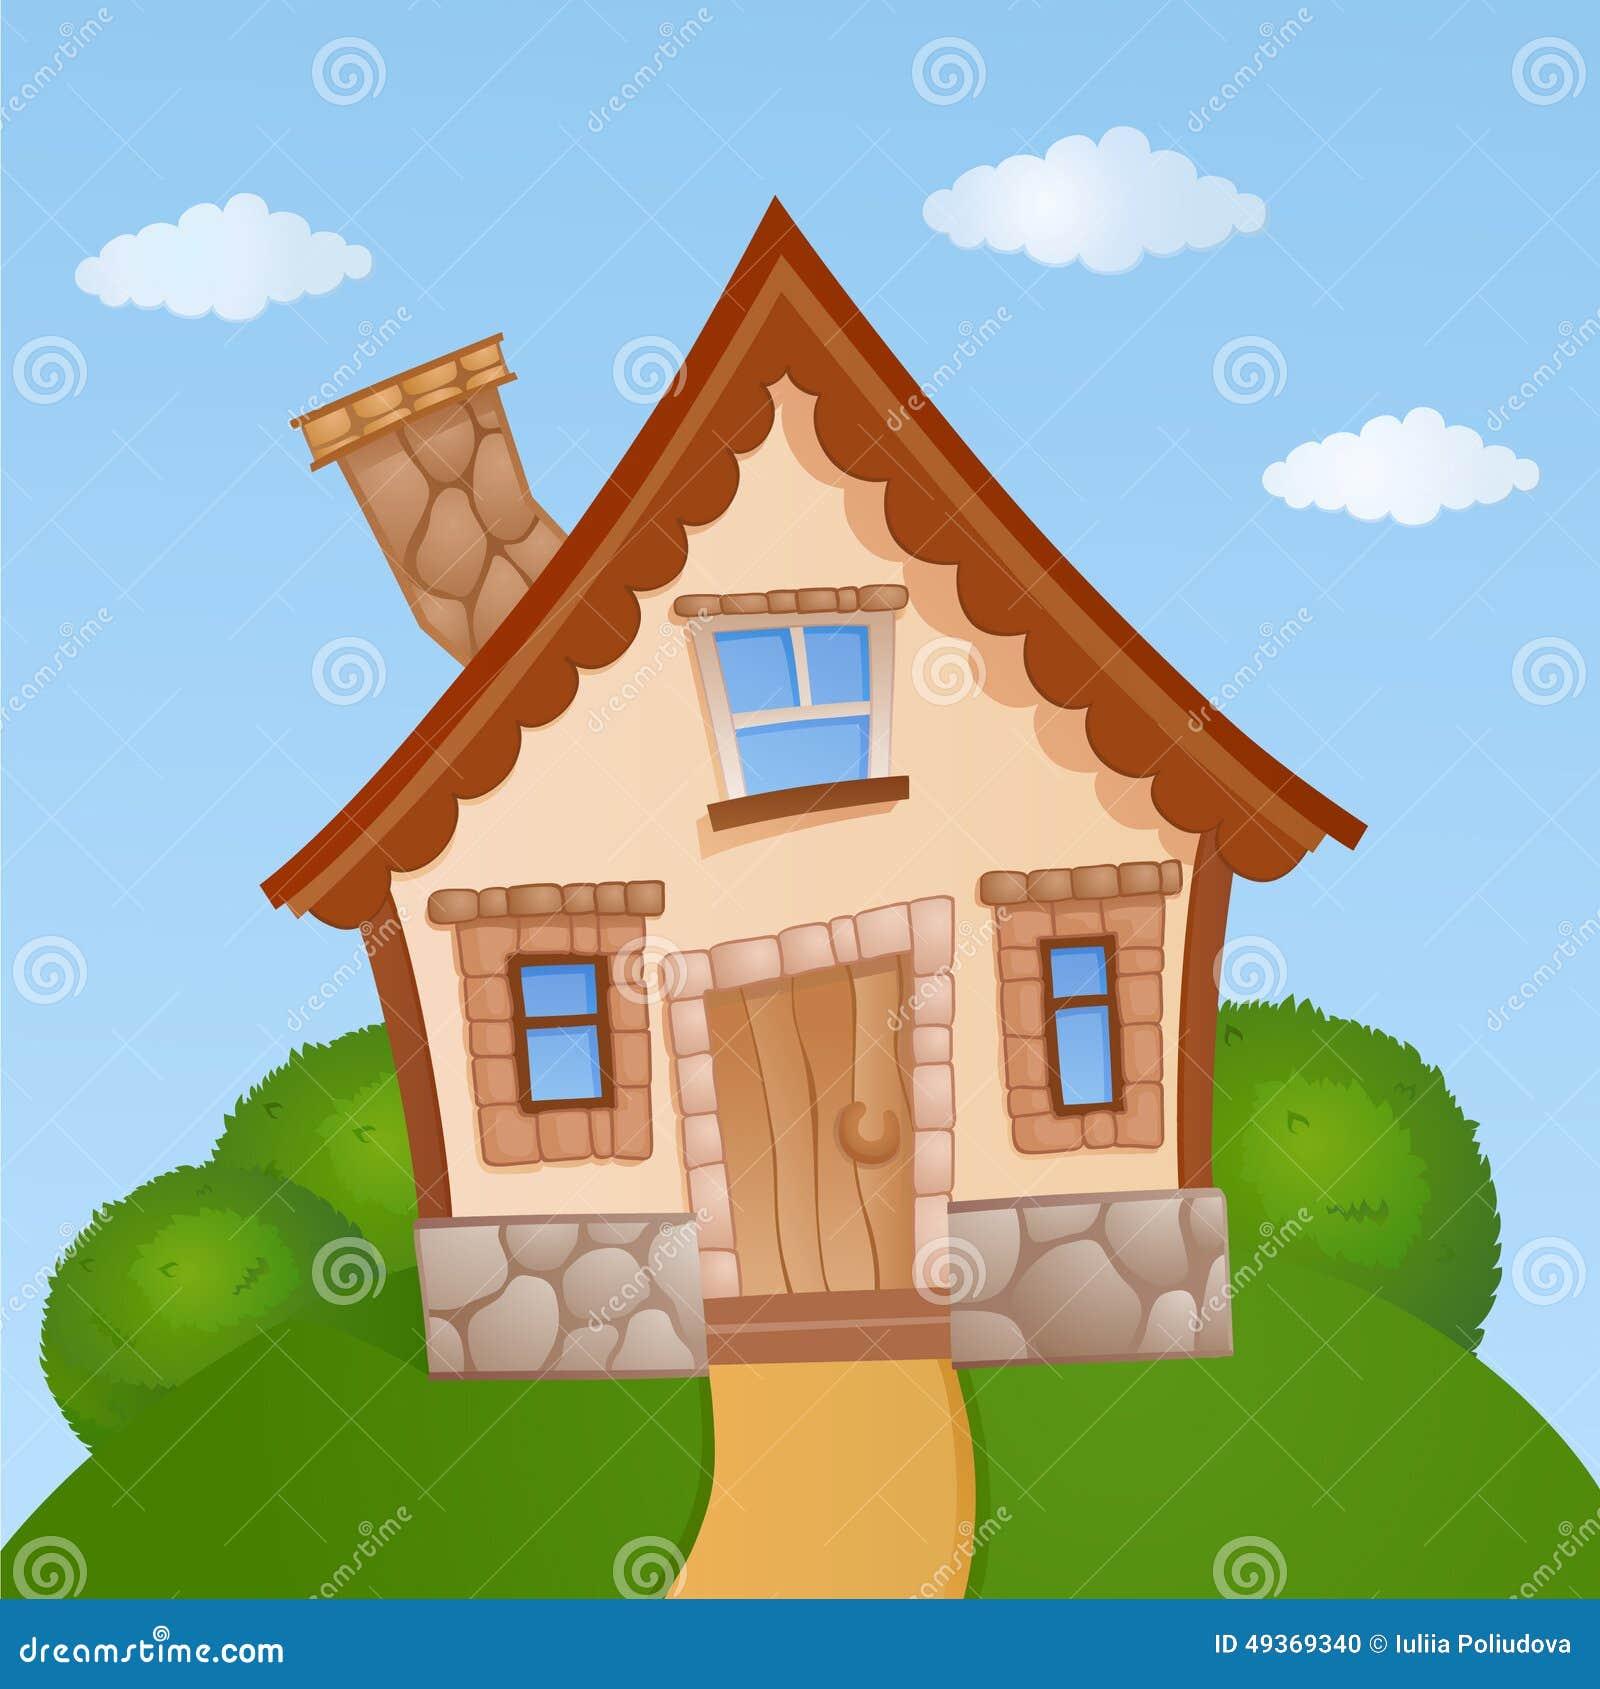 House design cartoon - Royalty Free Illustration Download Cartoon House